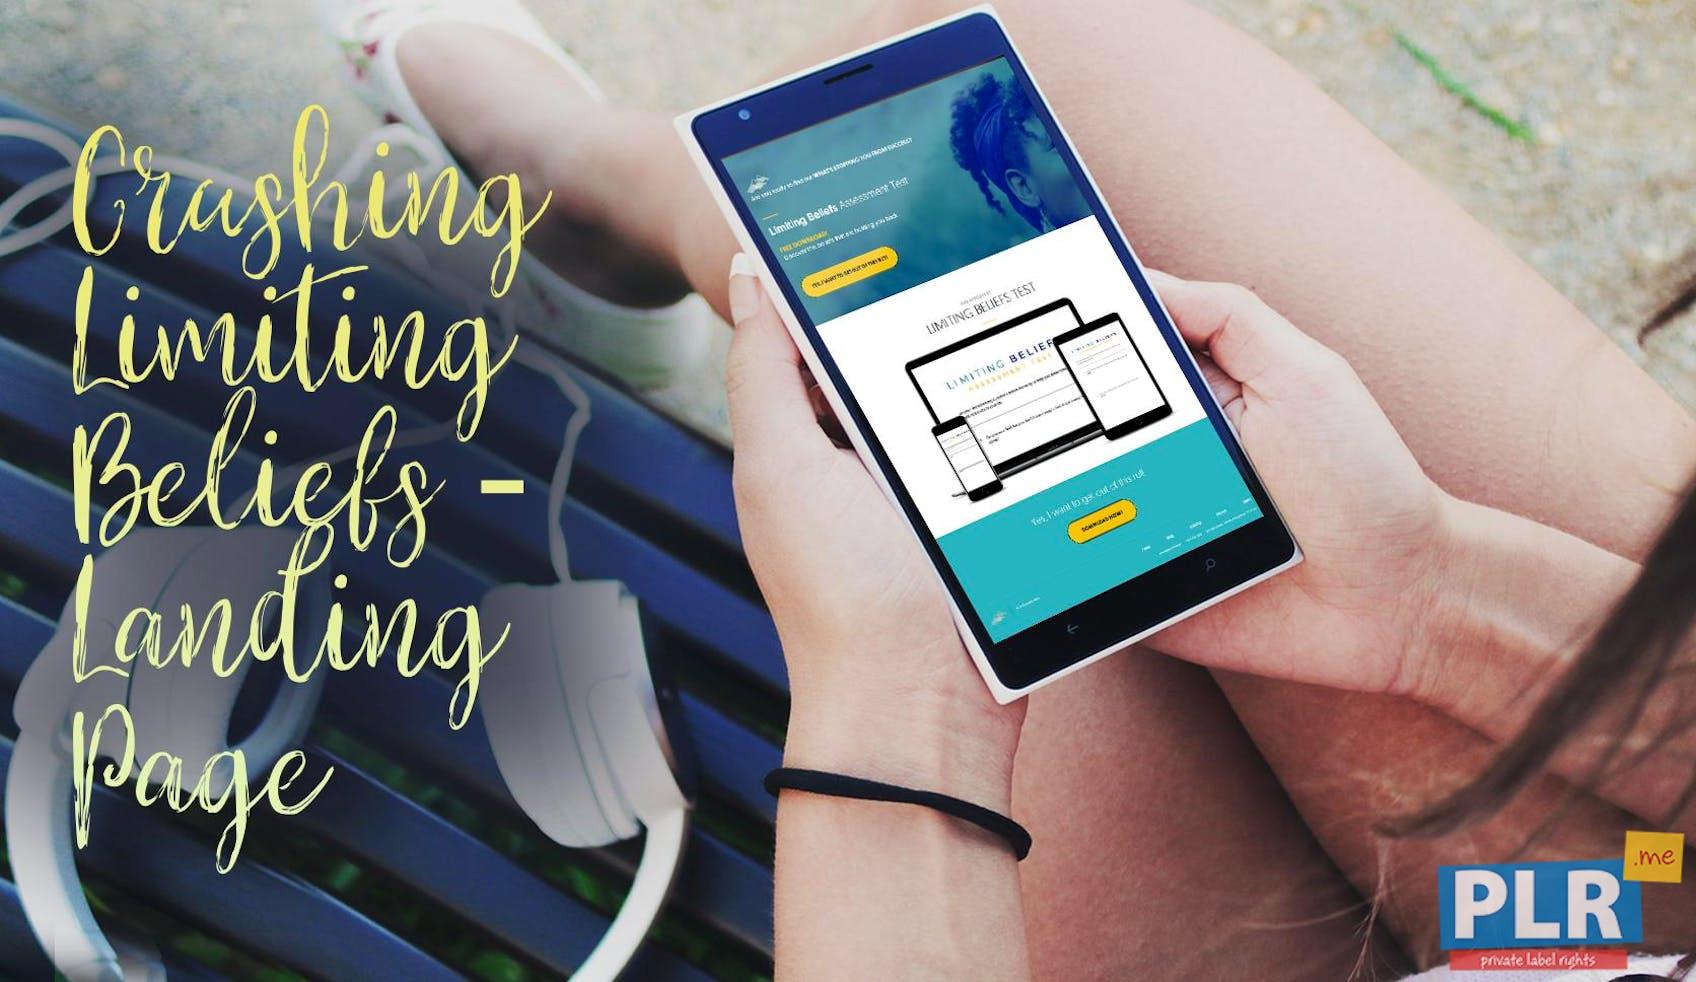 Crushing Limiting Beliefs - Landing Page